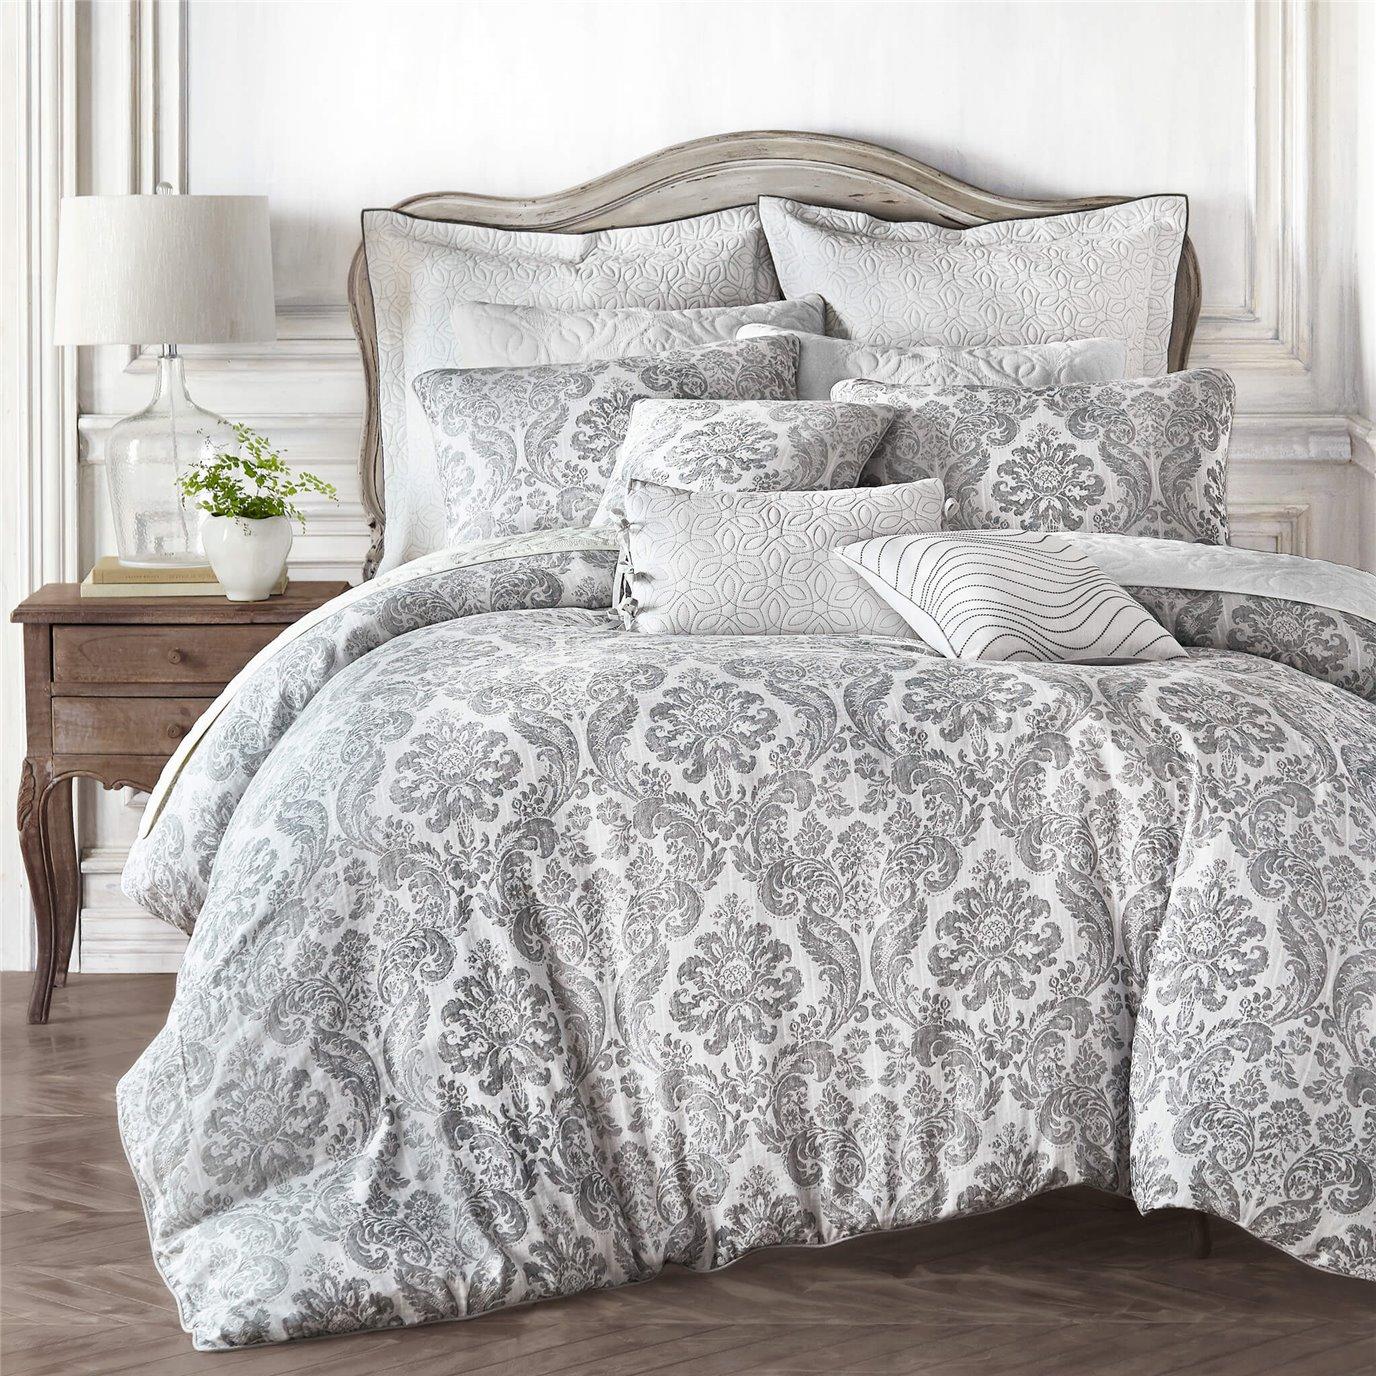 Croscill Saffira Queen 3PC Comforter Set